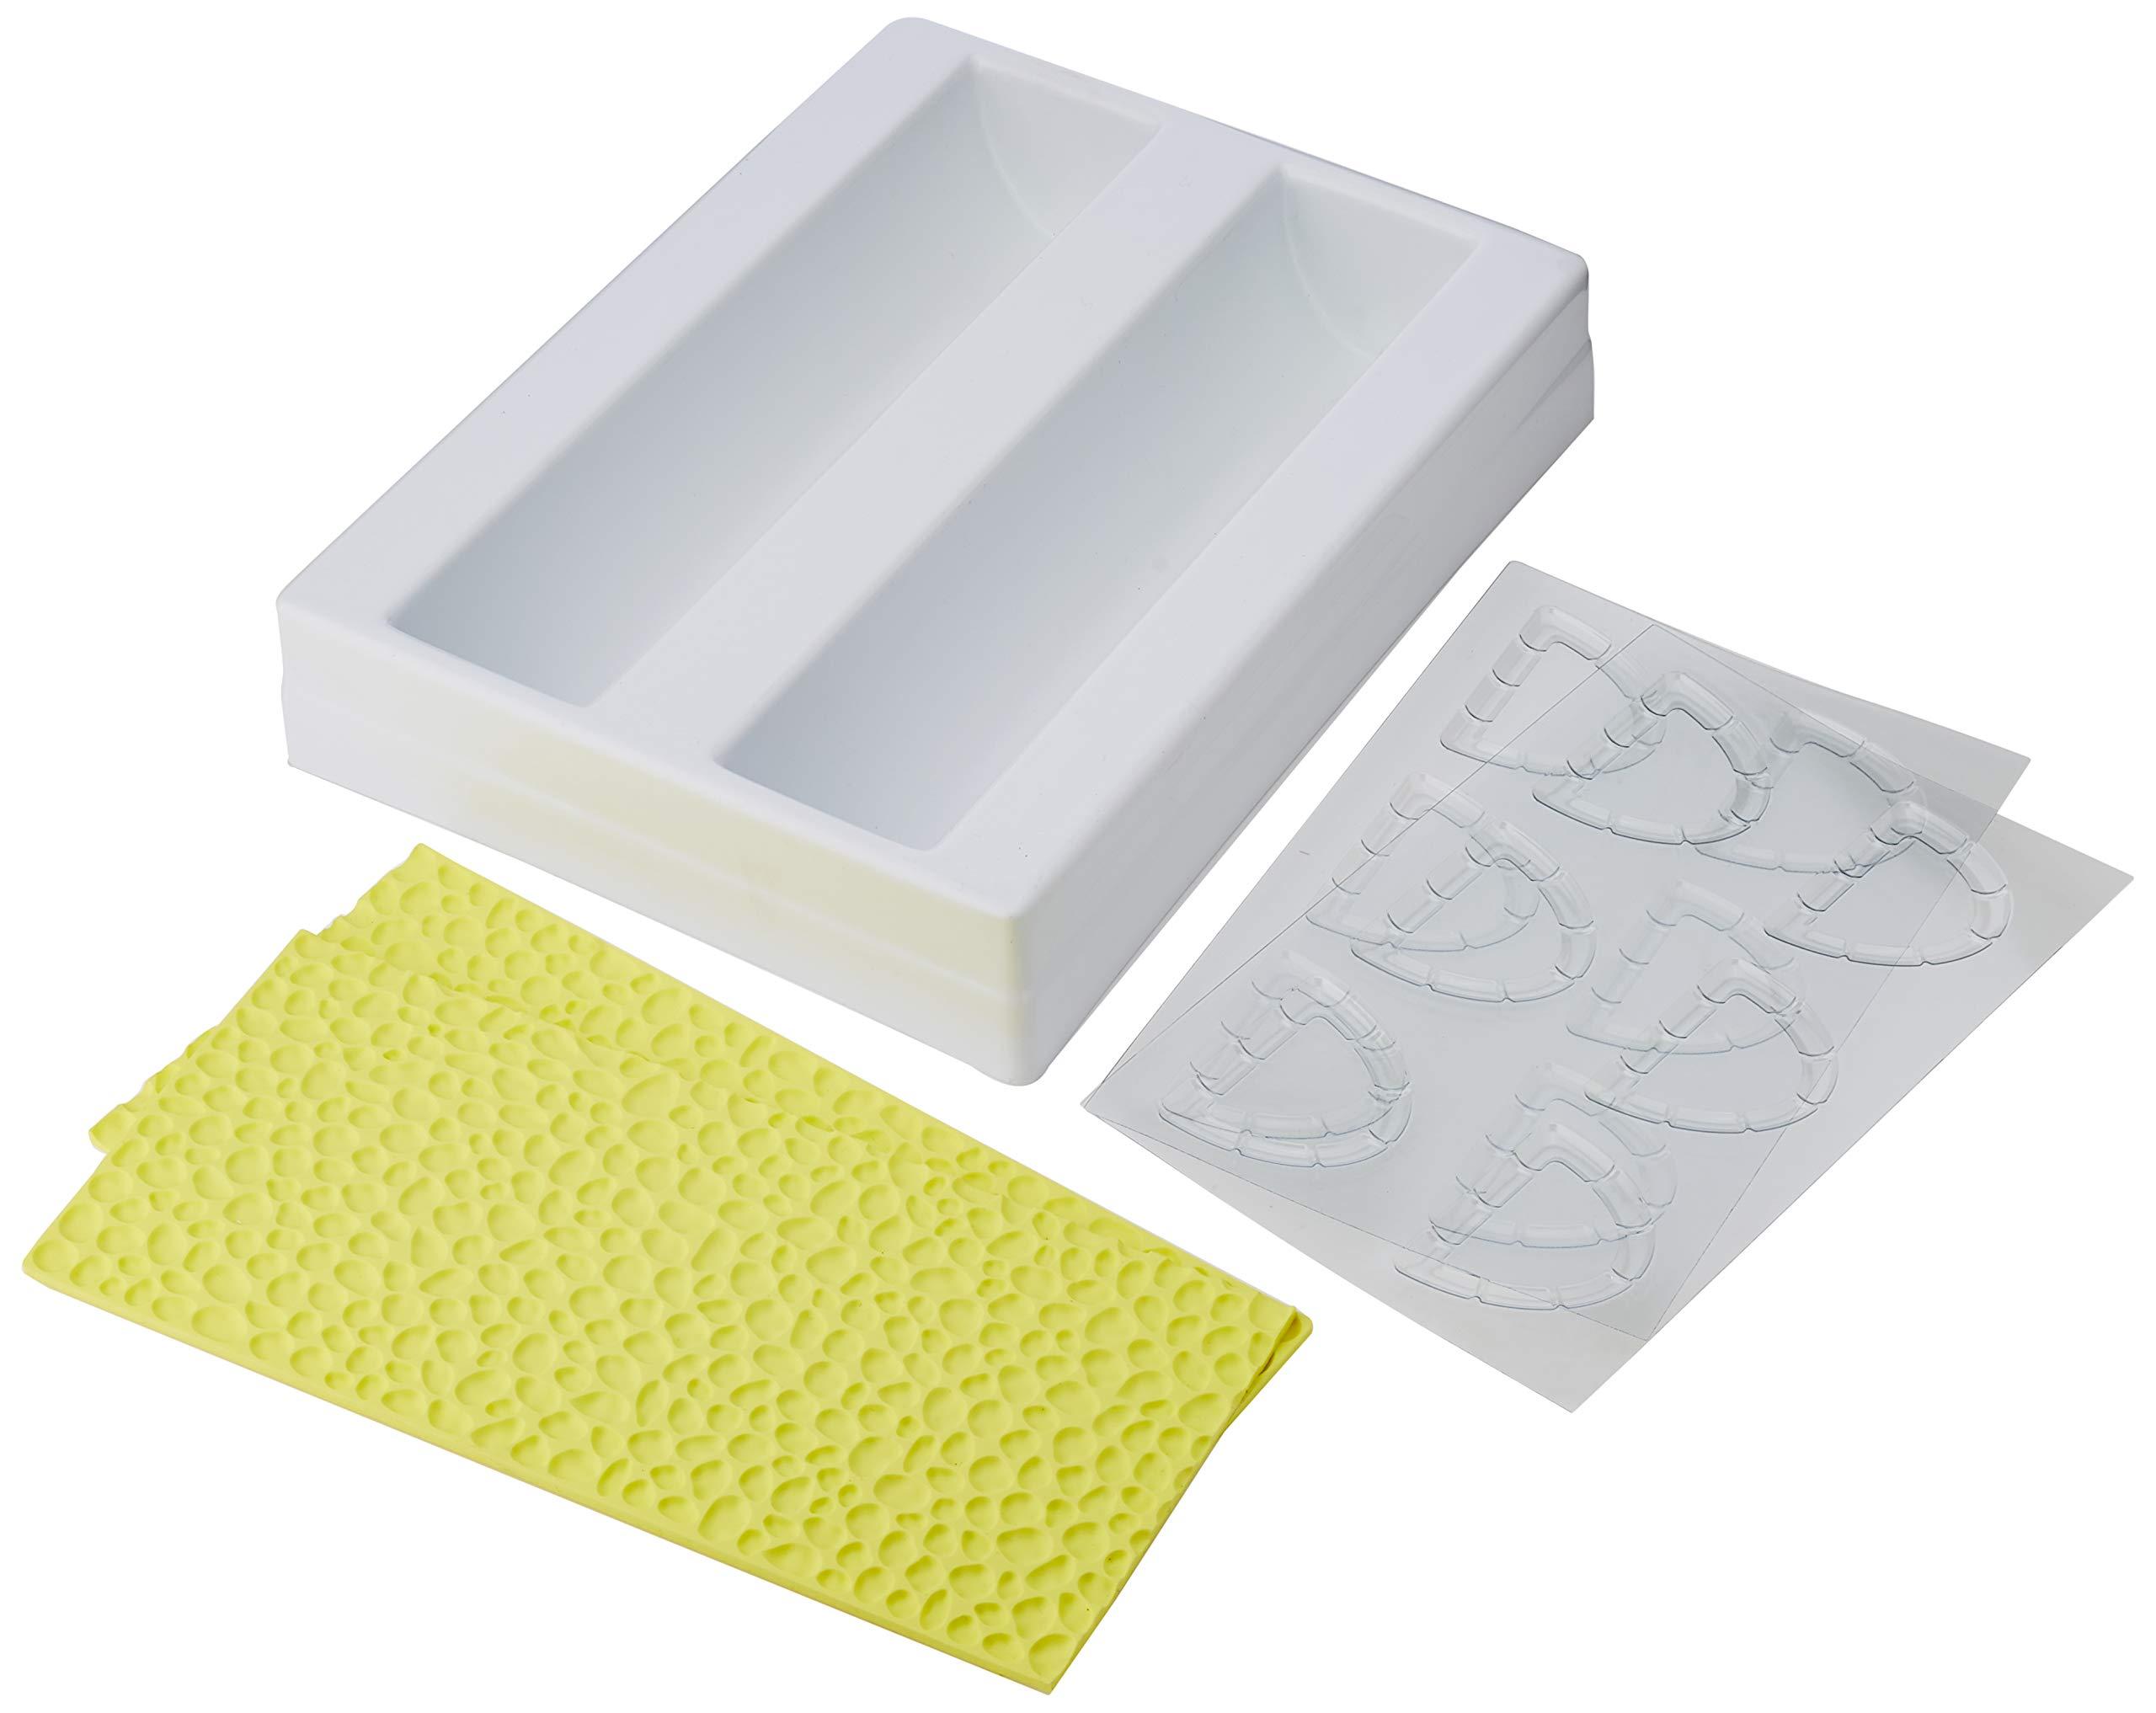 Martellato 30T06K Starter Stone Mould Kit, Plastic, Multicoloured